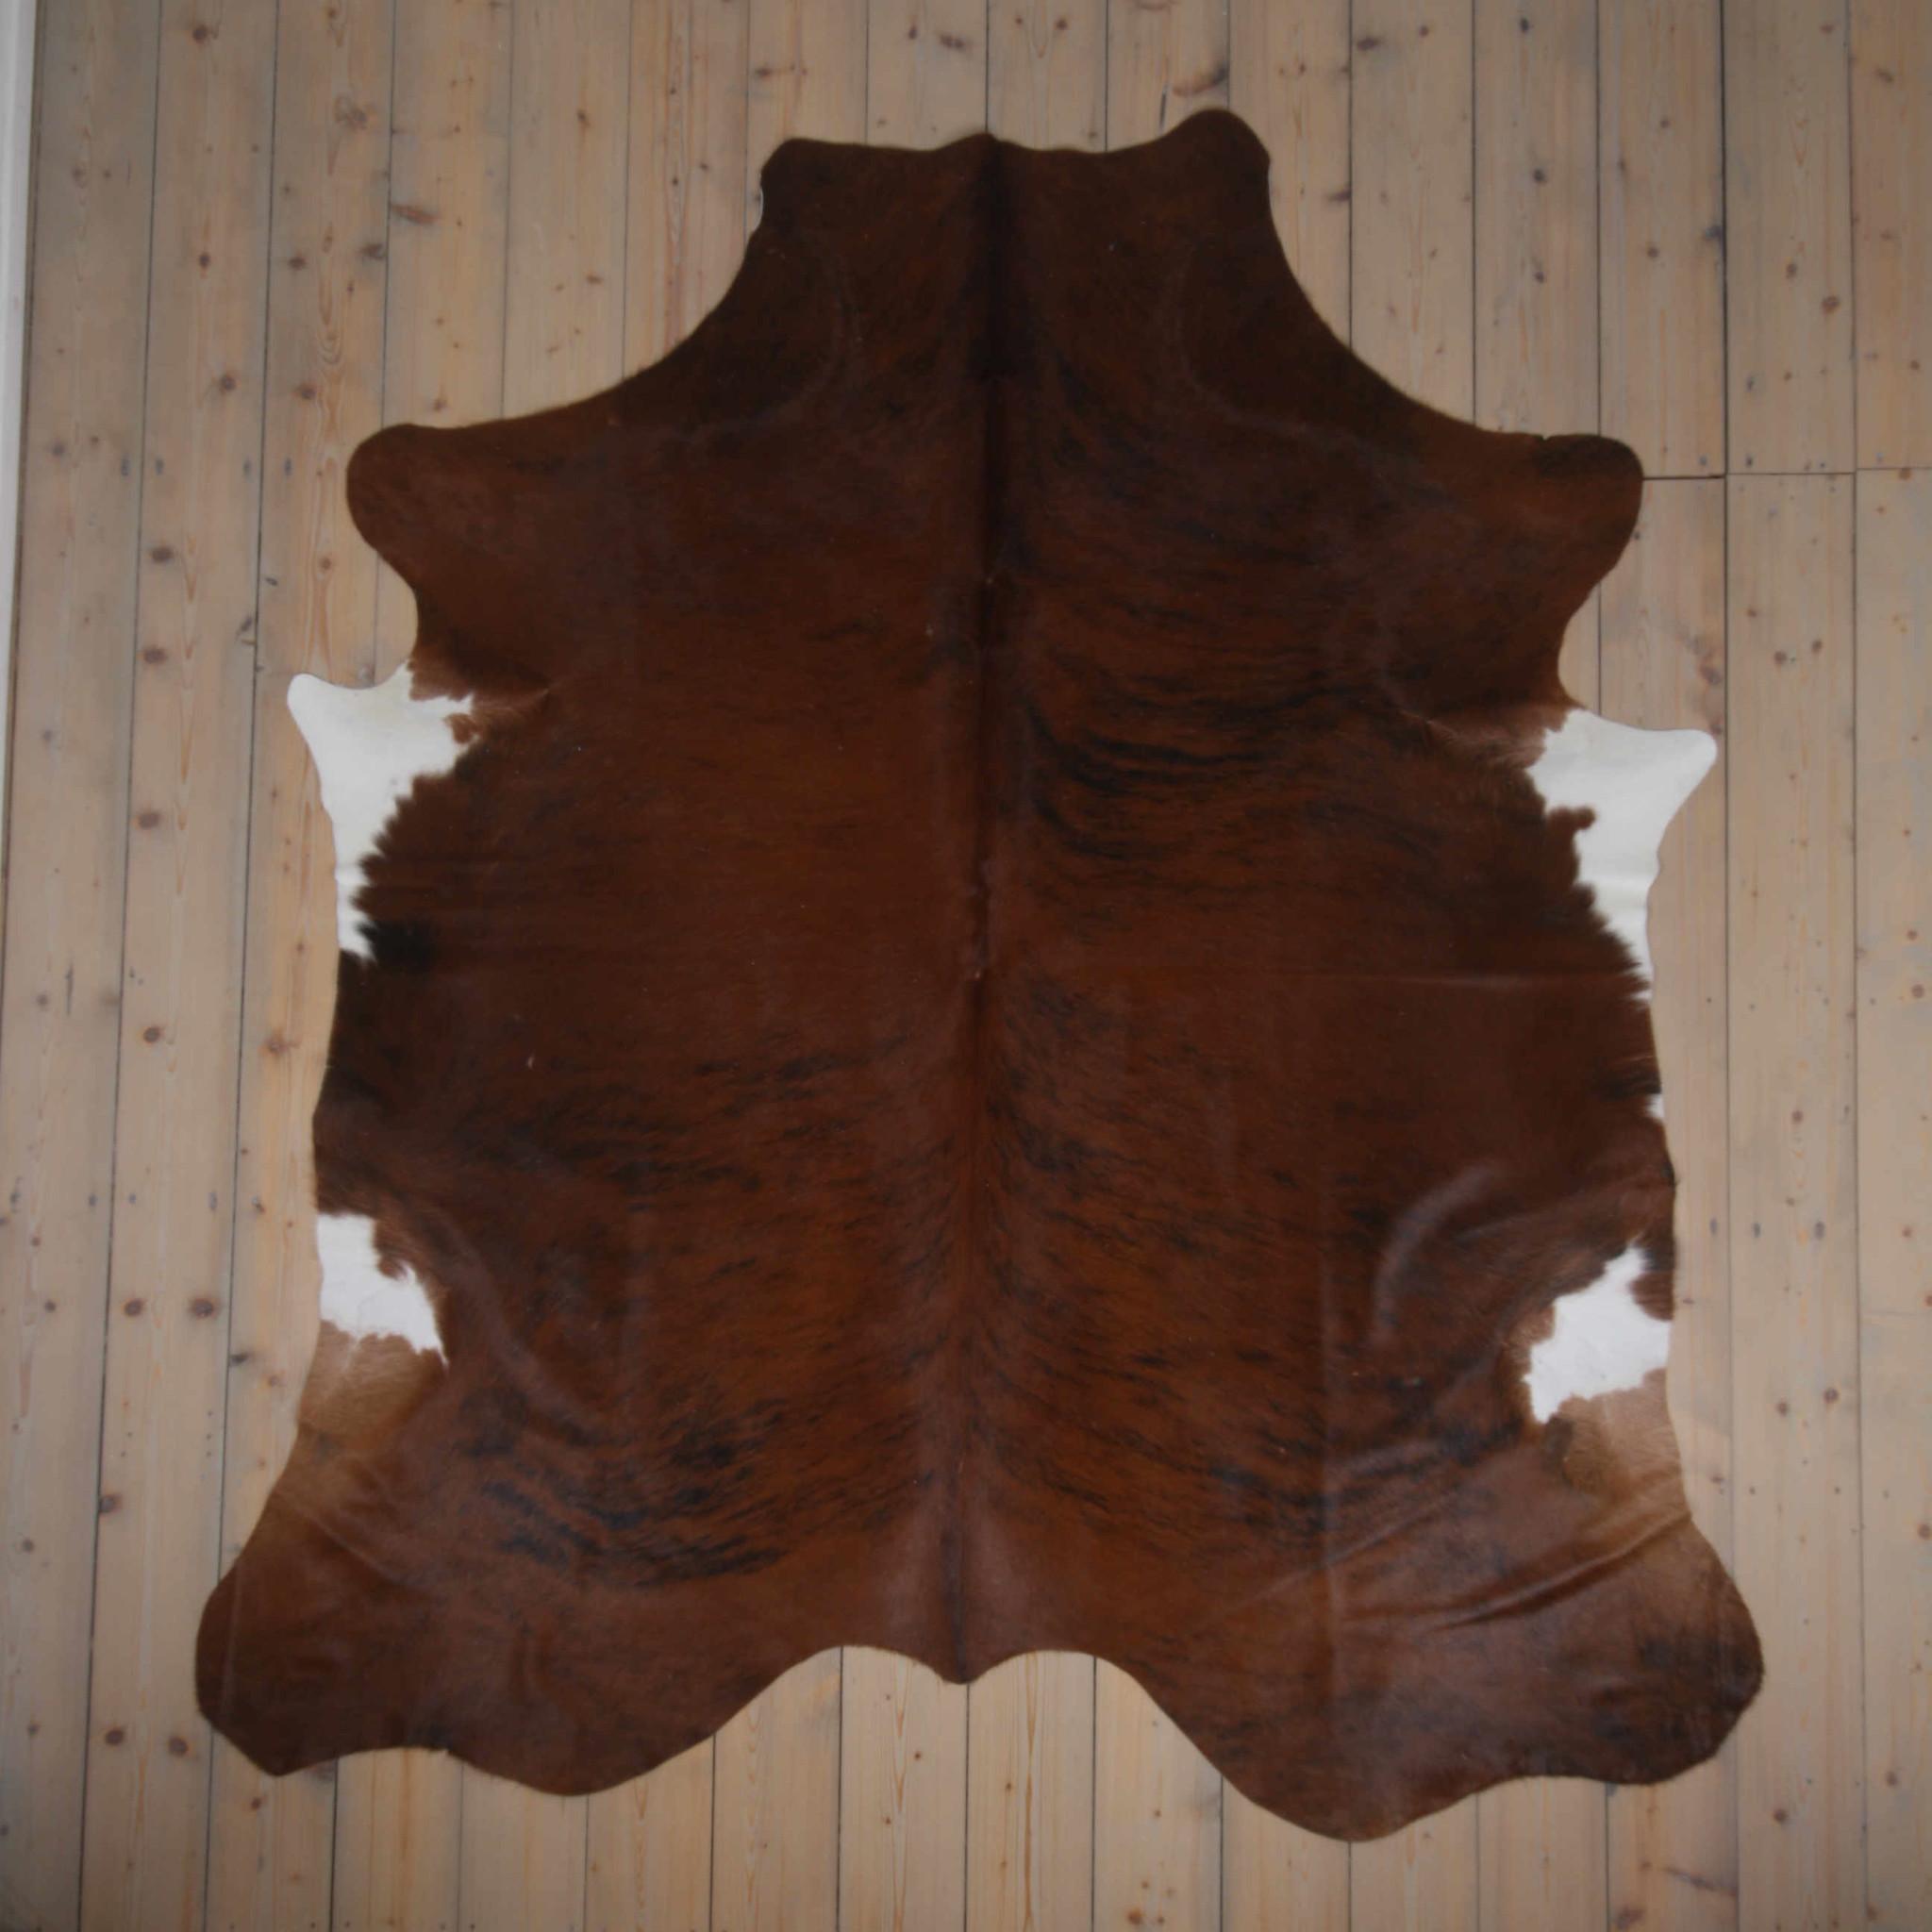 testVan Buren Koeienhuid - Driekleur - ca. 220x200 cm